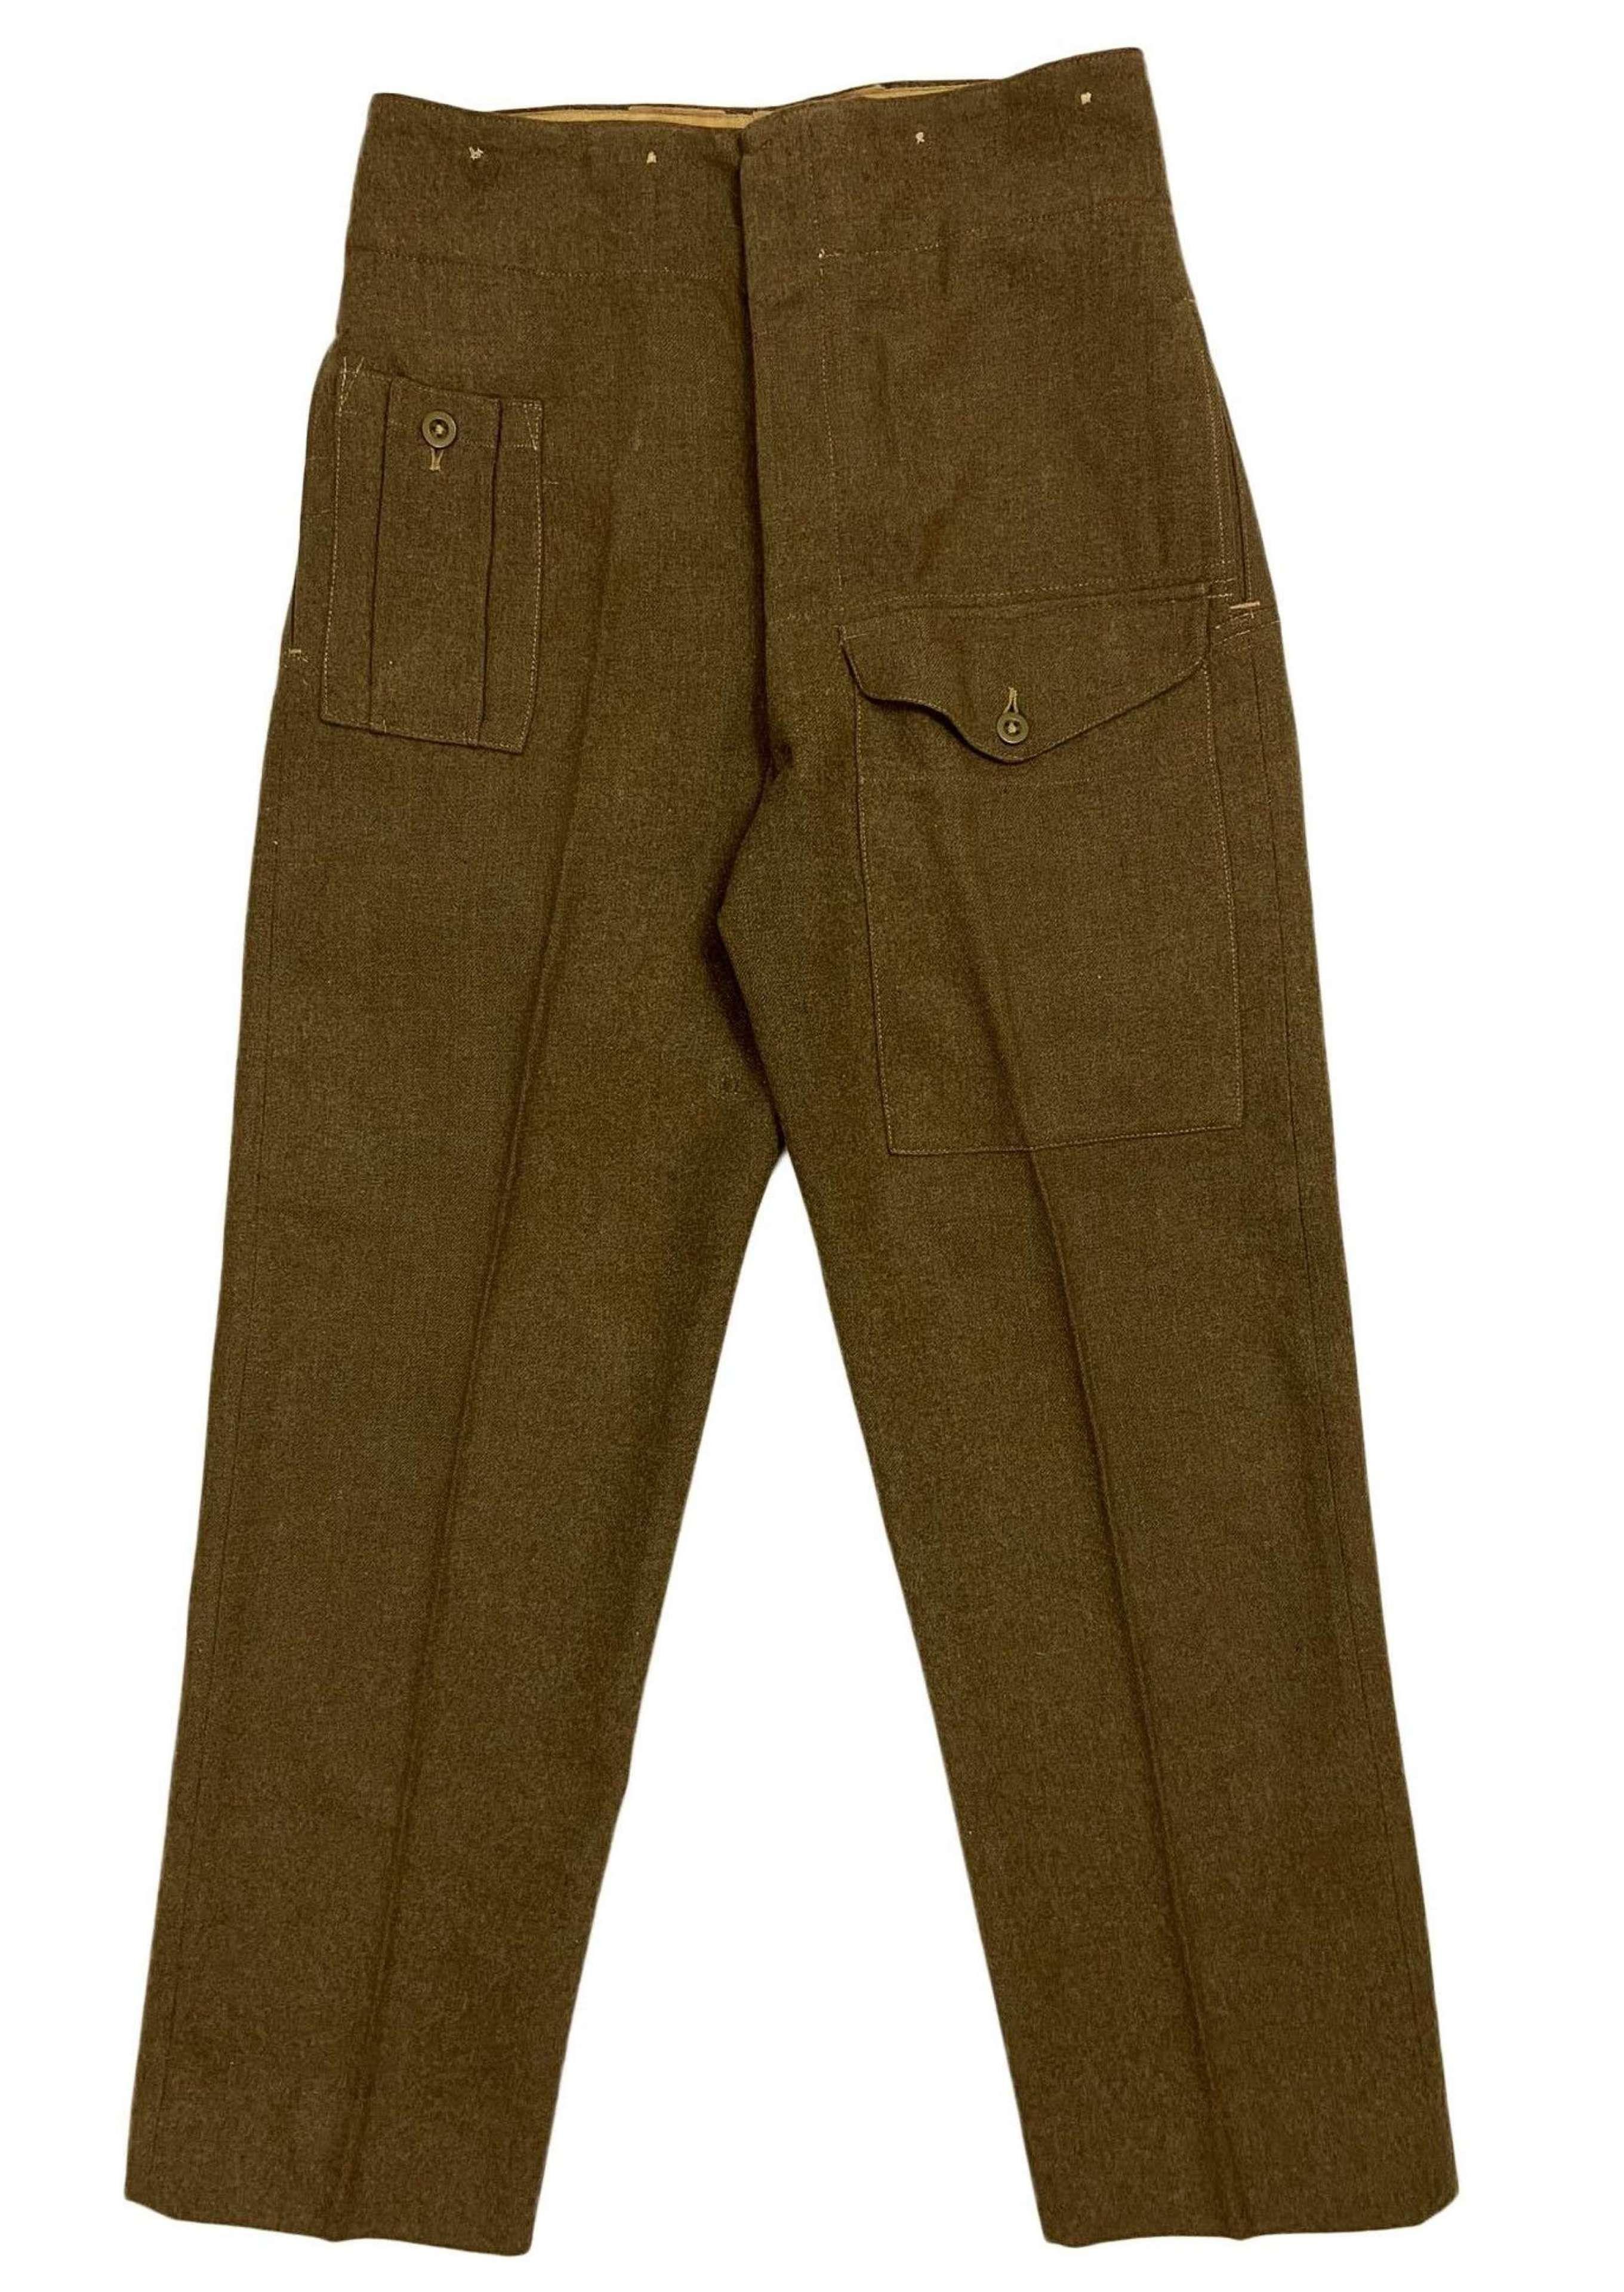 Original 1940 Pattern (Austerity) Battledress Trousers